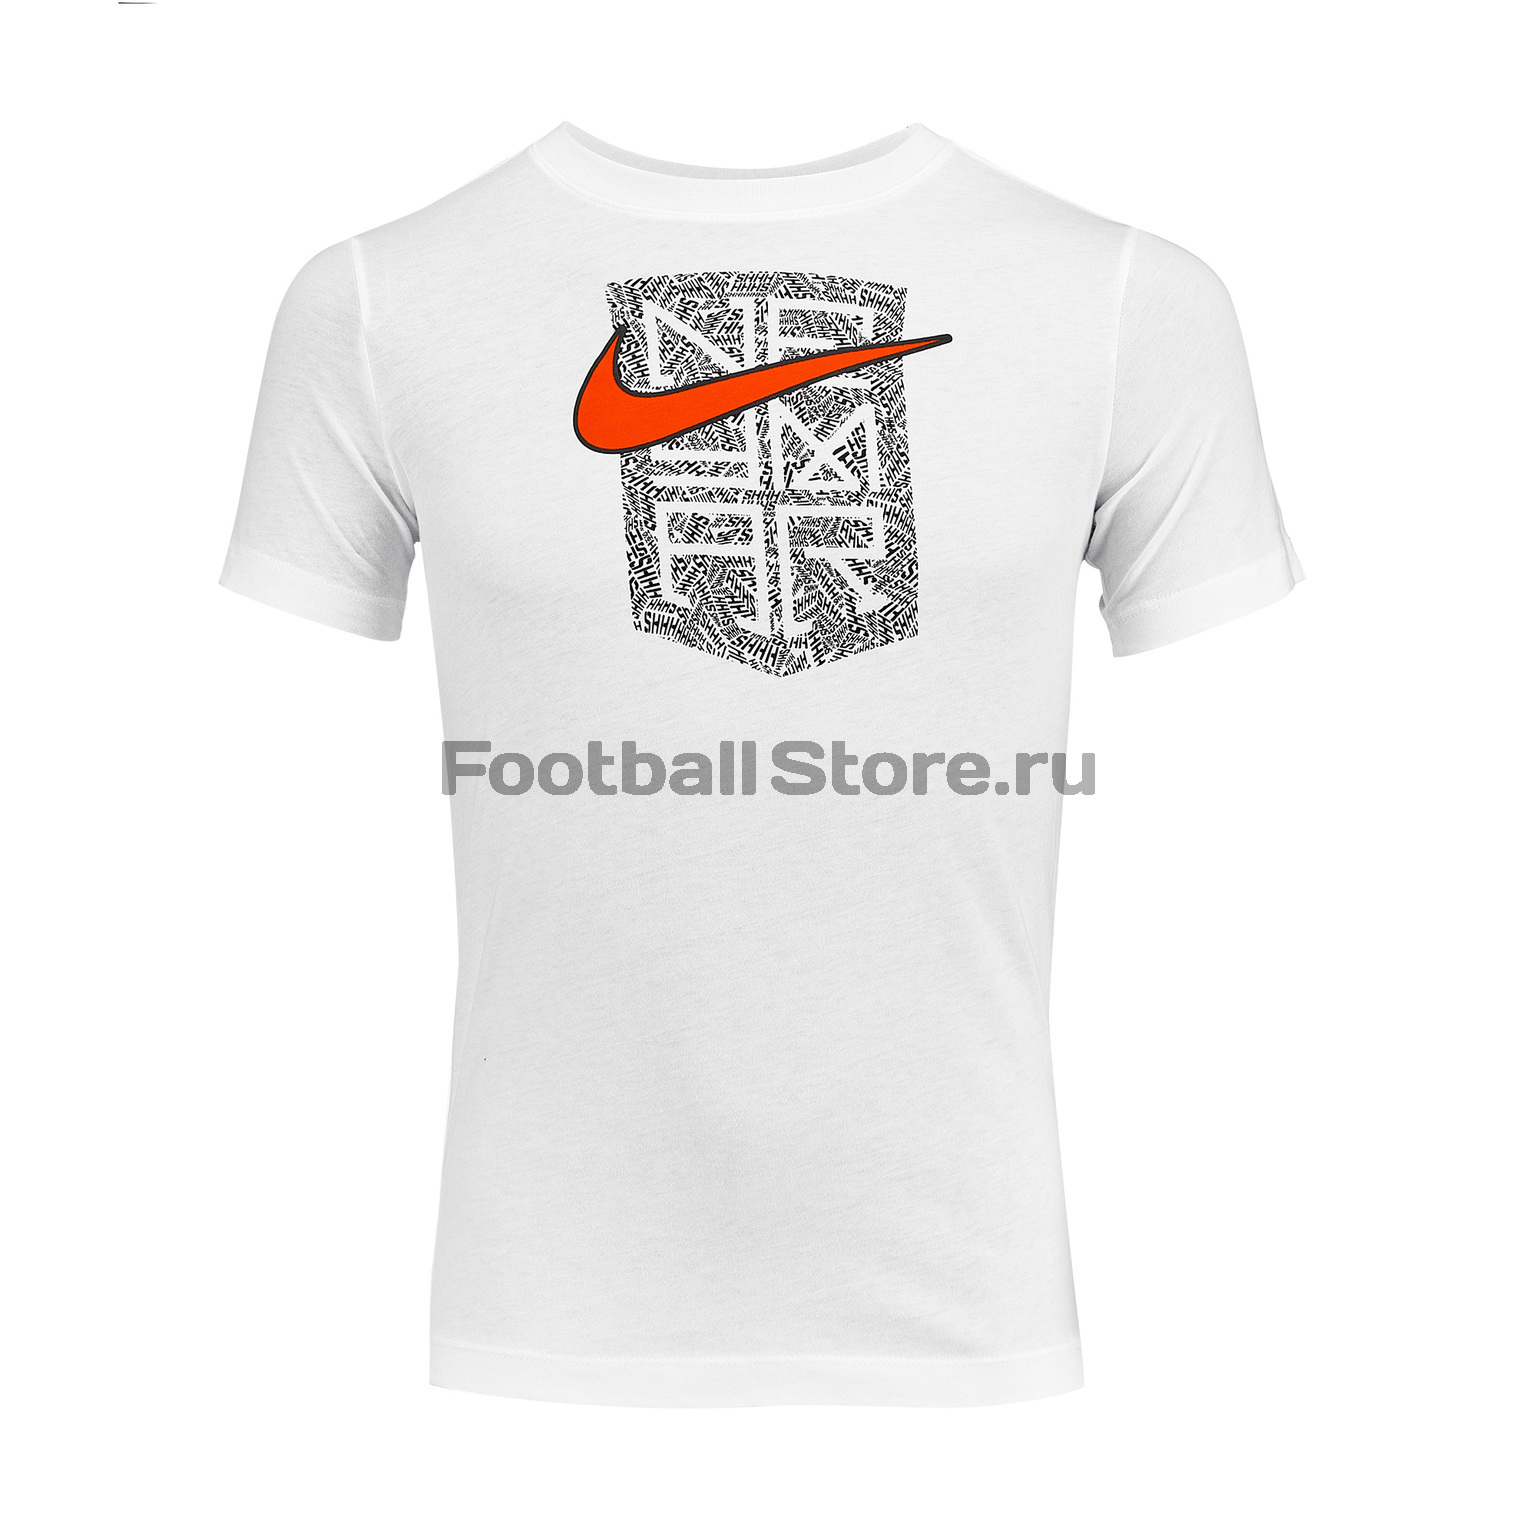 цена на Футболка подростковая Nike Neymar Tee Hook BQ7694-100